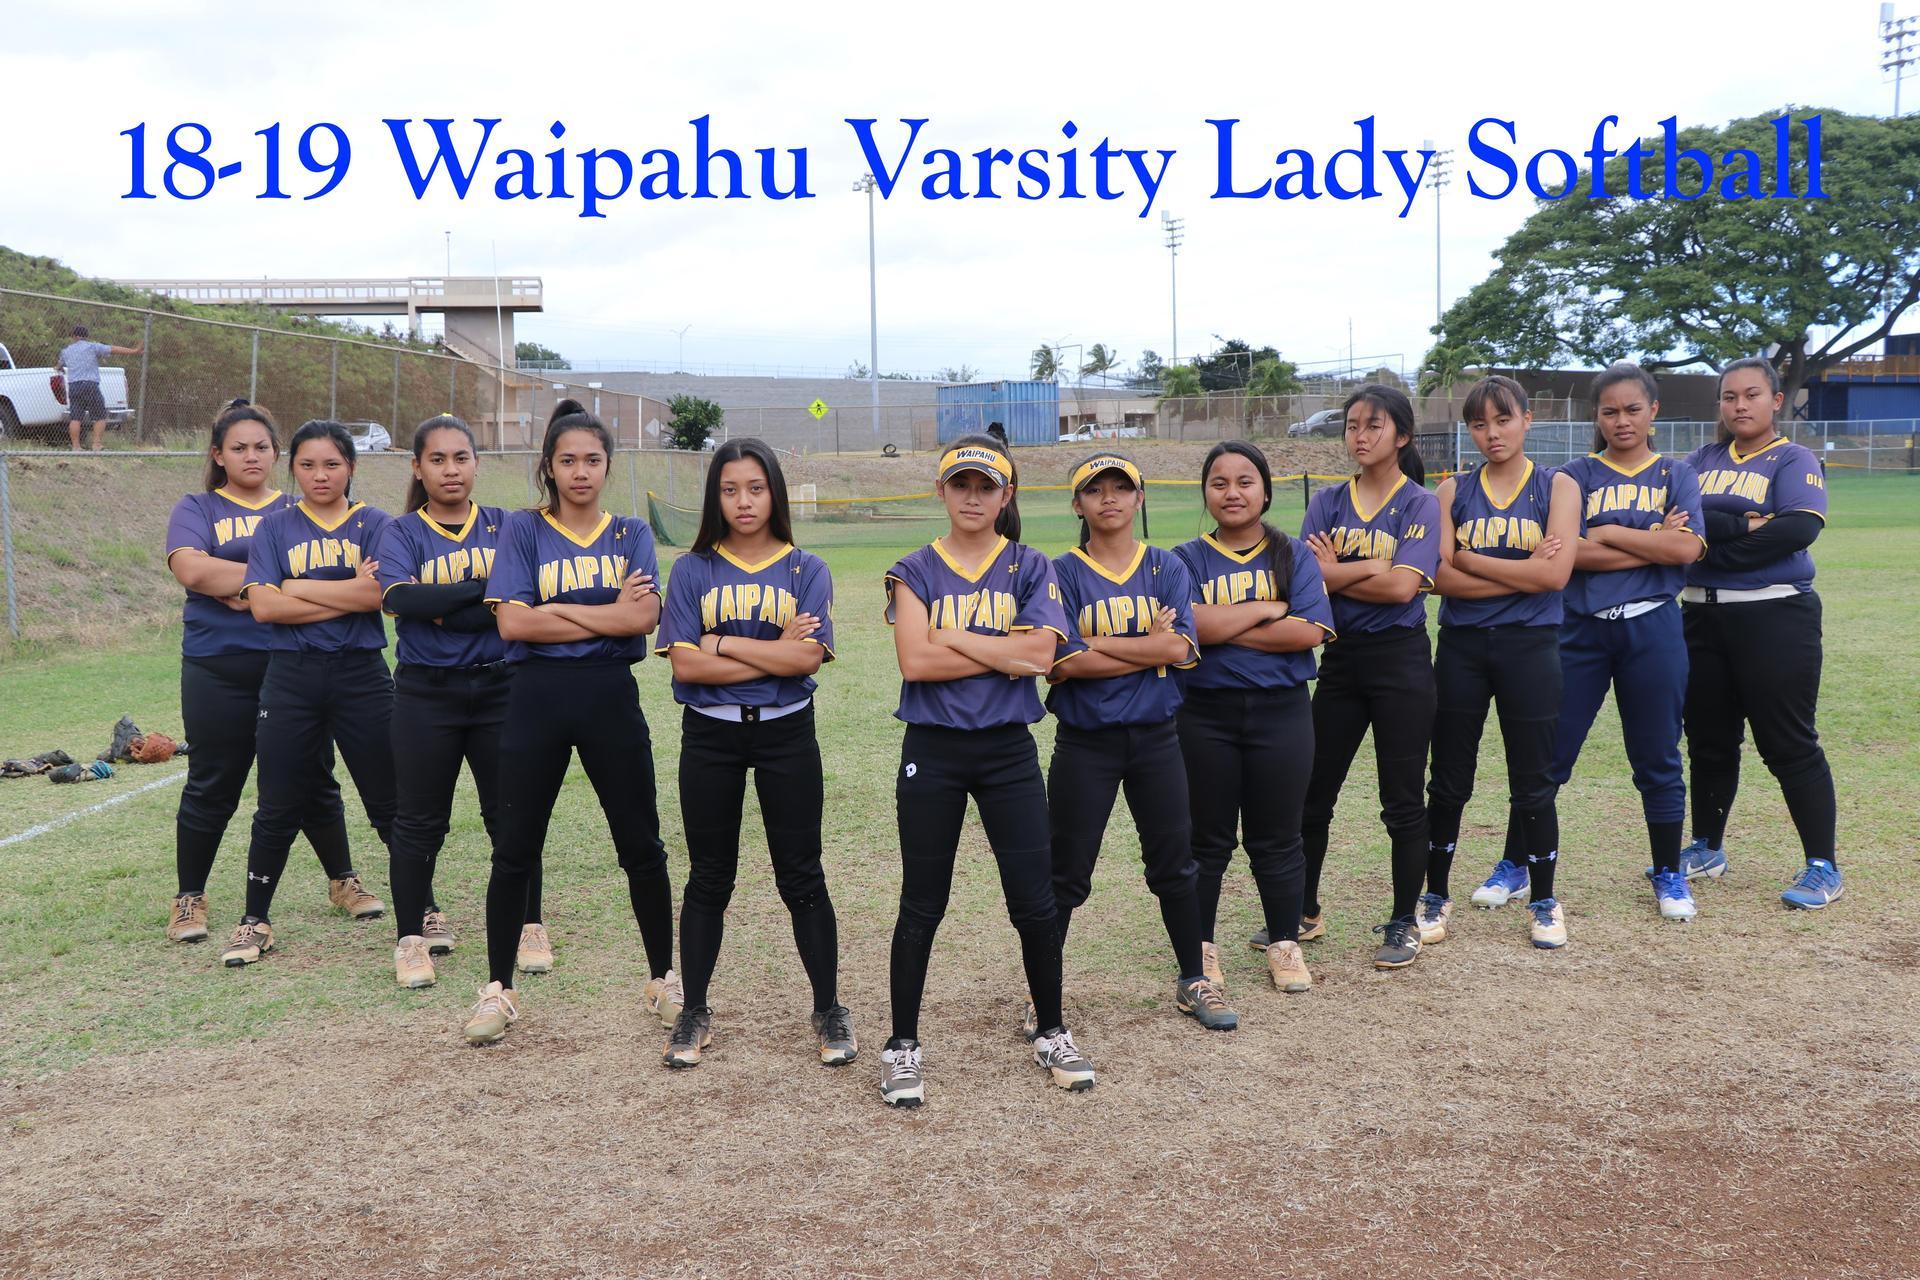 18-19 Softball Varsity